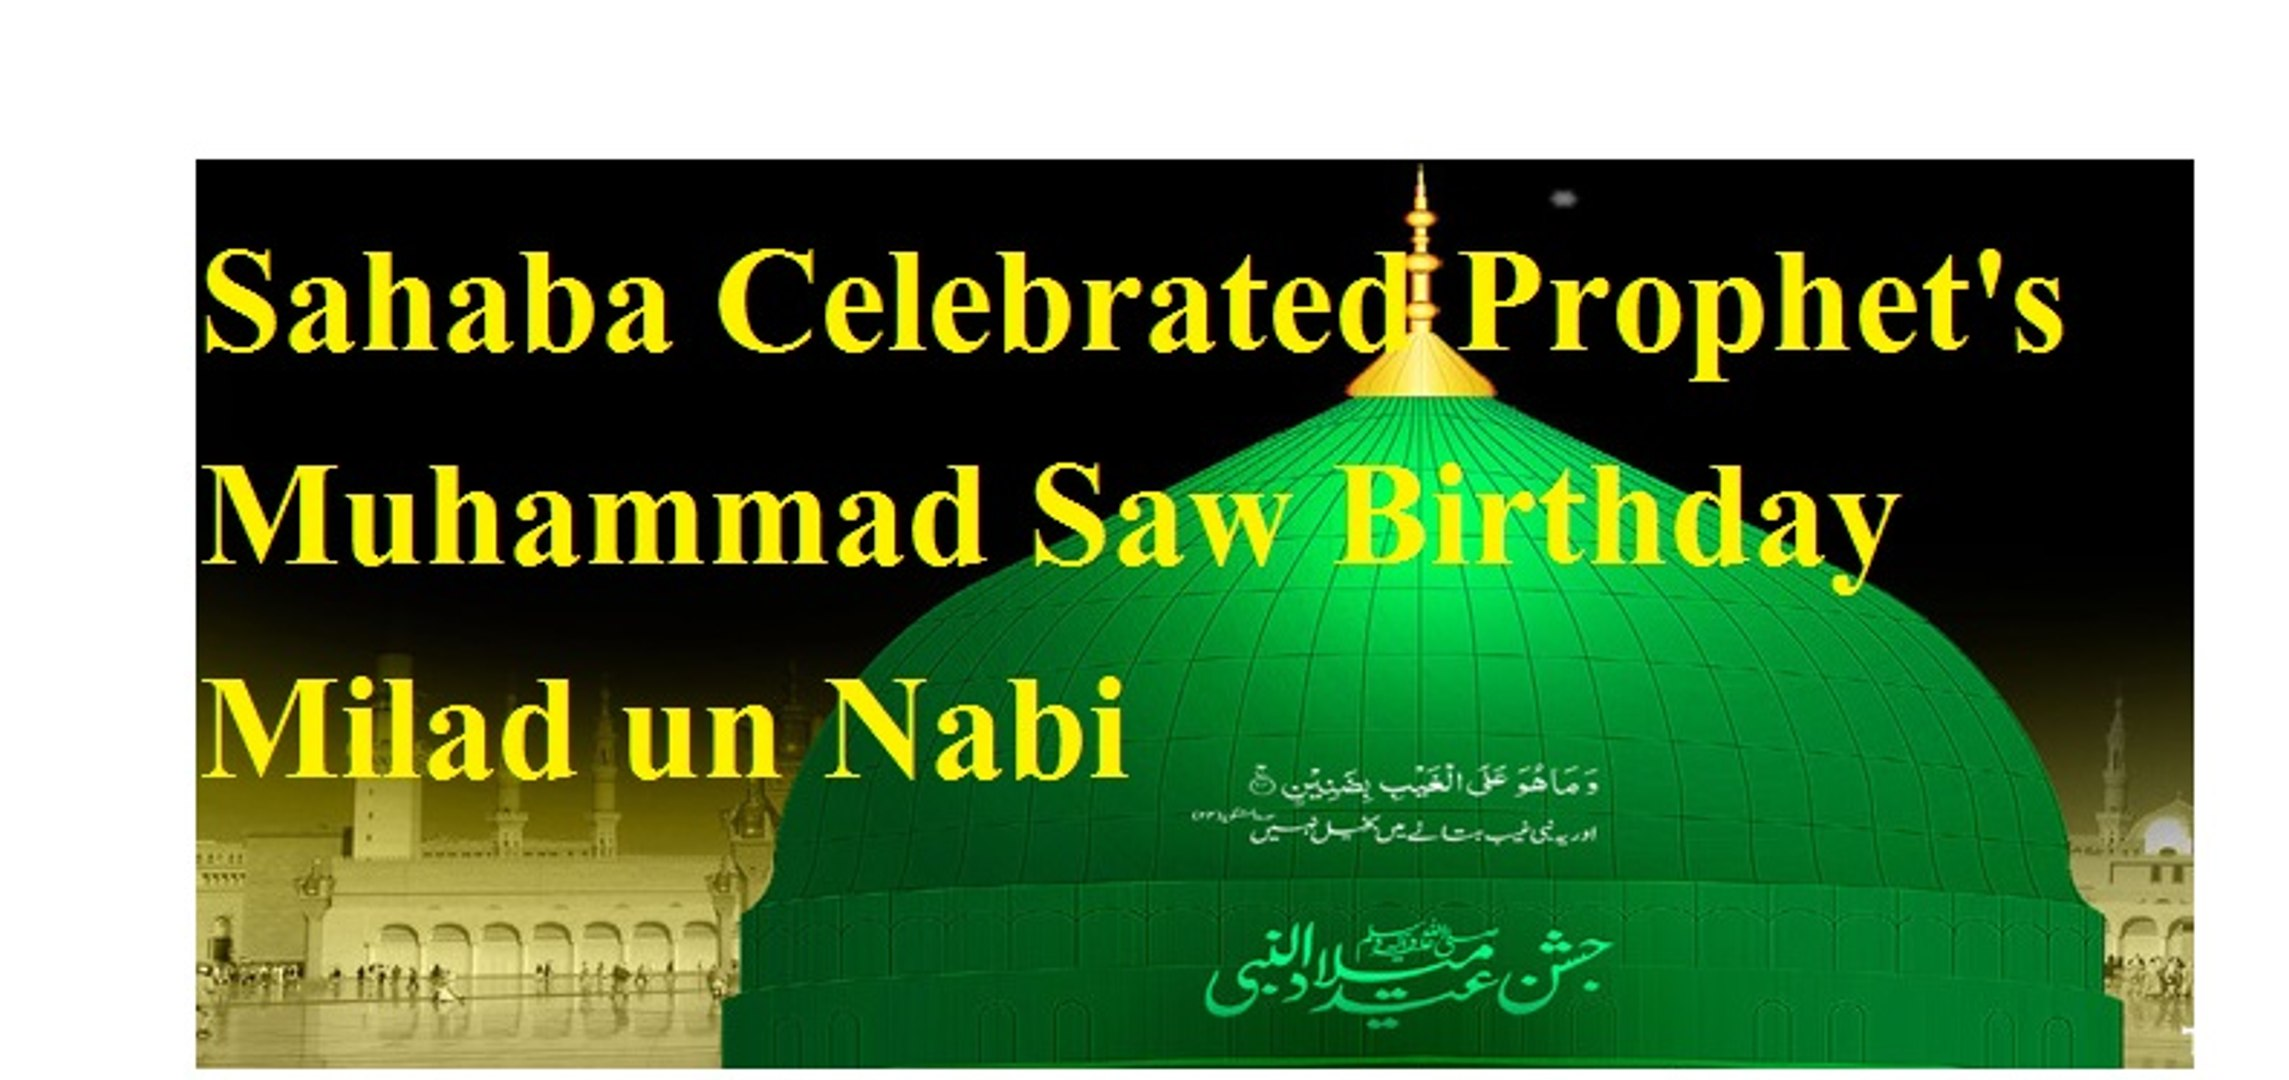 Sahaba Celebrated Prophet's Muhammad (Saw) Birthday Mawlid Un Nabi 2017